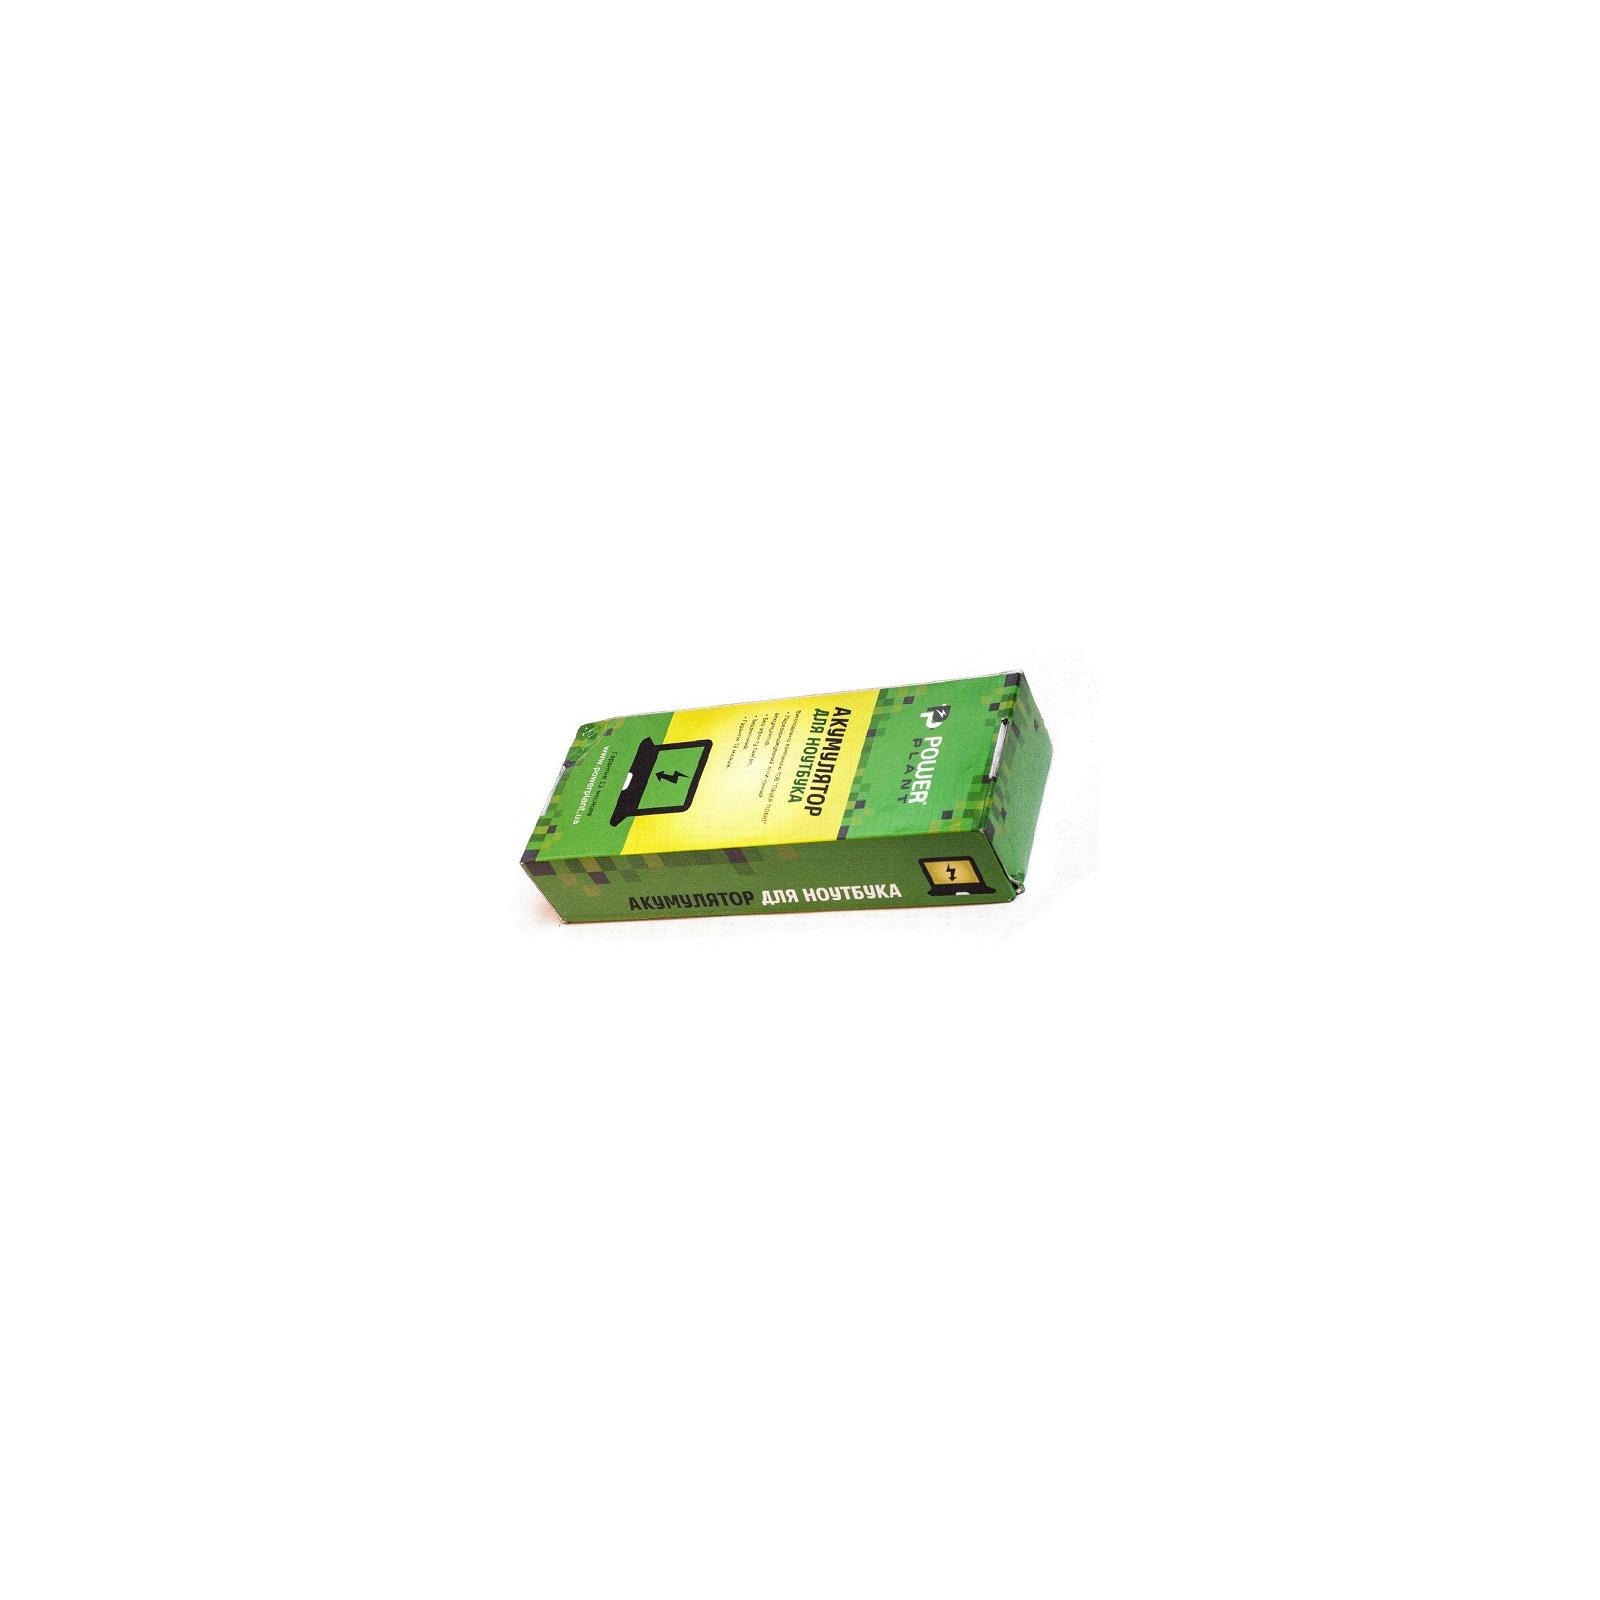 Аккумулятор для ноутбука DELL Inspiron 6000 (D5318, DL5319LP) 11.1V6600mAh PowerPlant (NB00000115) изображение 3